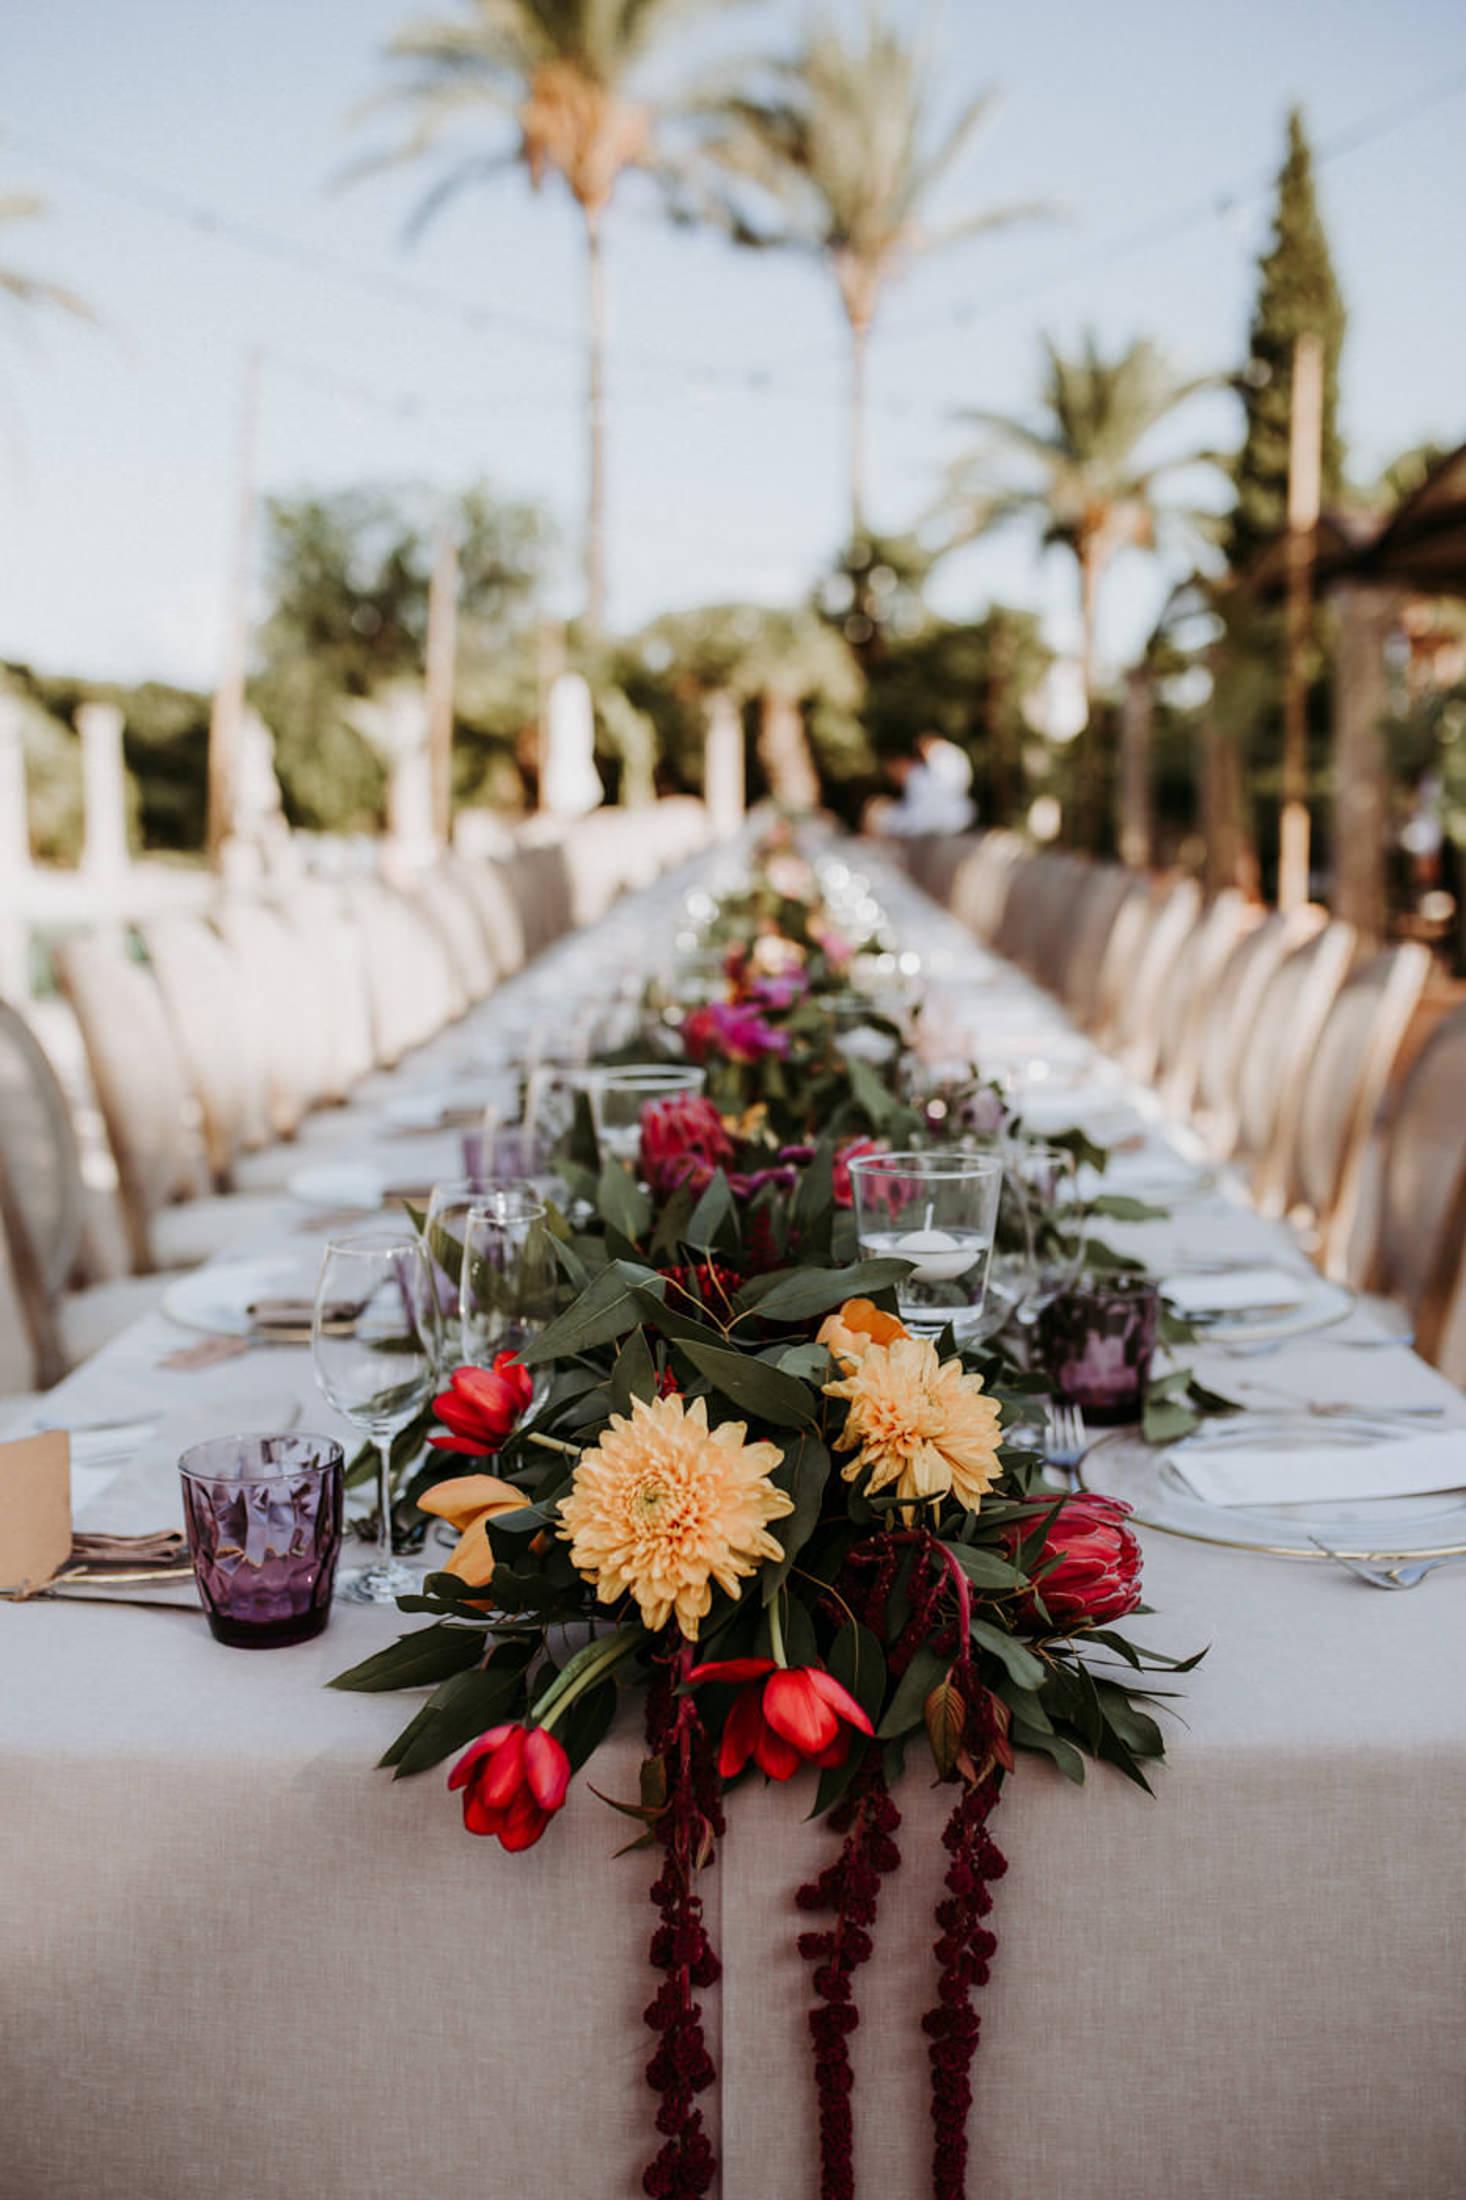 Wedding_Photographer_Mallorca_Daniela-Marquardt_Photography_New_York_Iceland_Tuscany_Santorini_Portugal_Austria_Bavaria_Elopement_Hochzeitsfotograf_AntjeRajat2_97